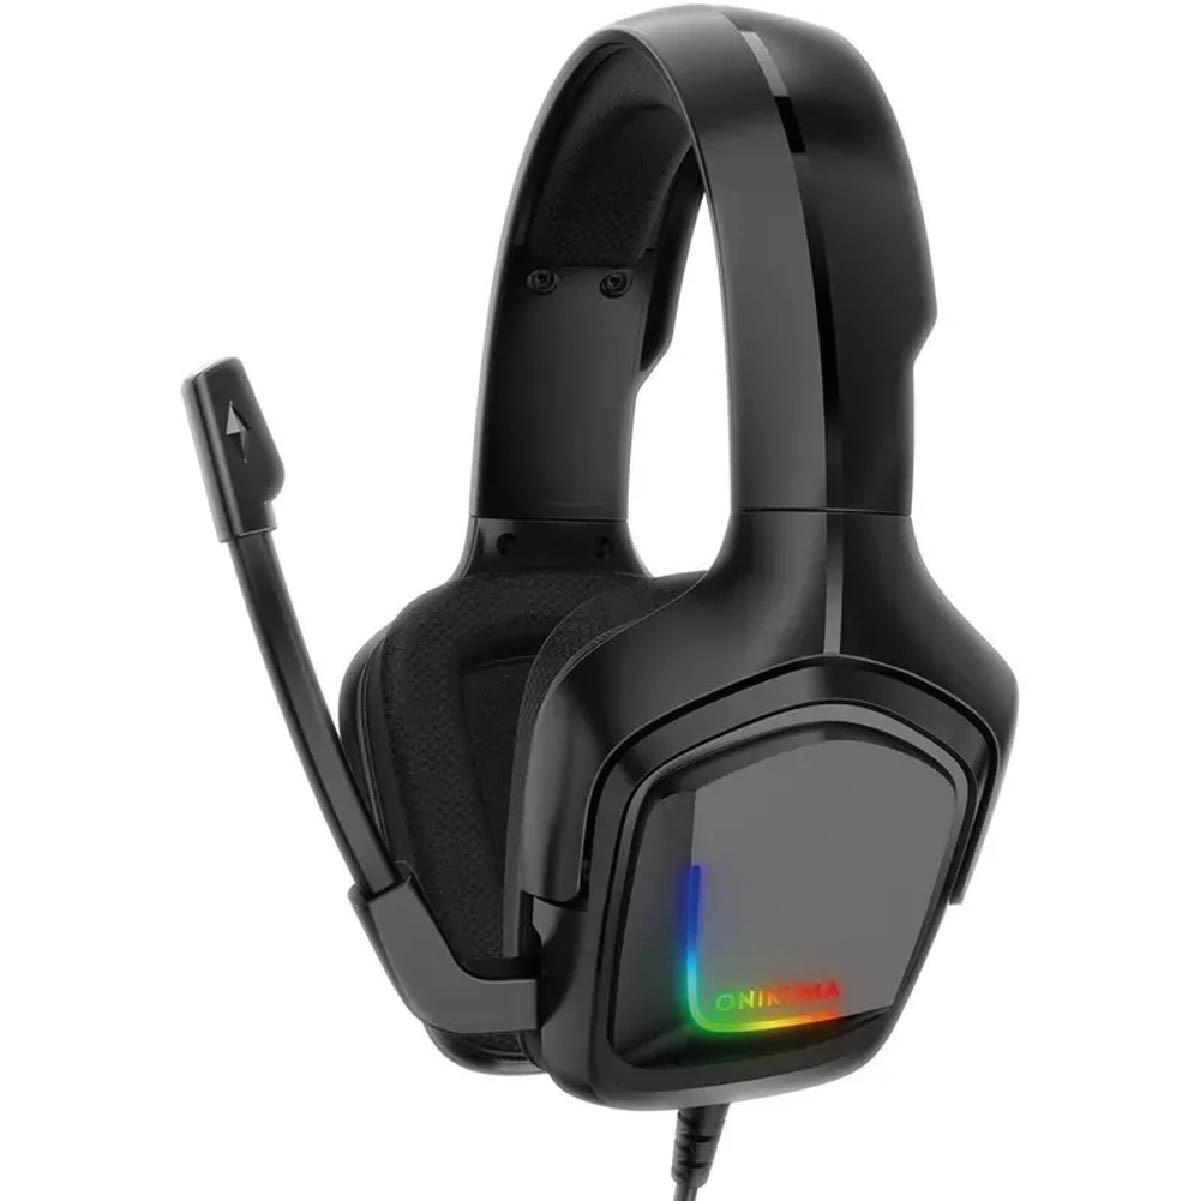 Fone de Ouvido Gamer Headset Onikuma K20 PS4/Xboxone/PC RGB